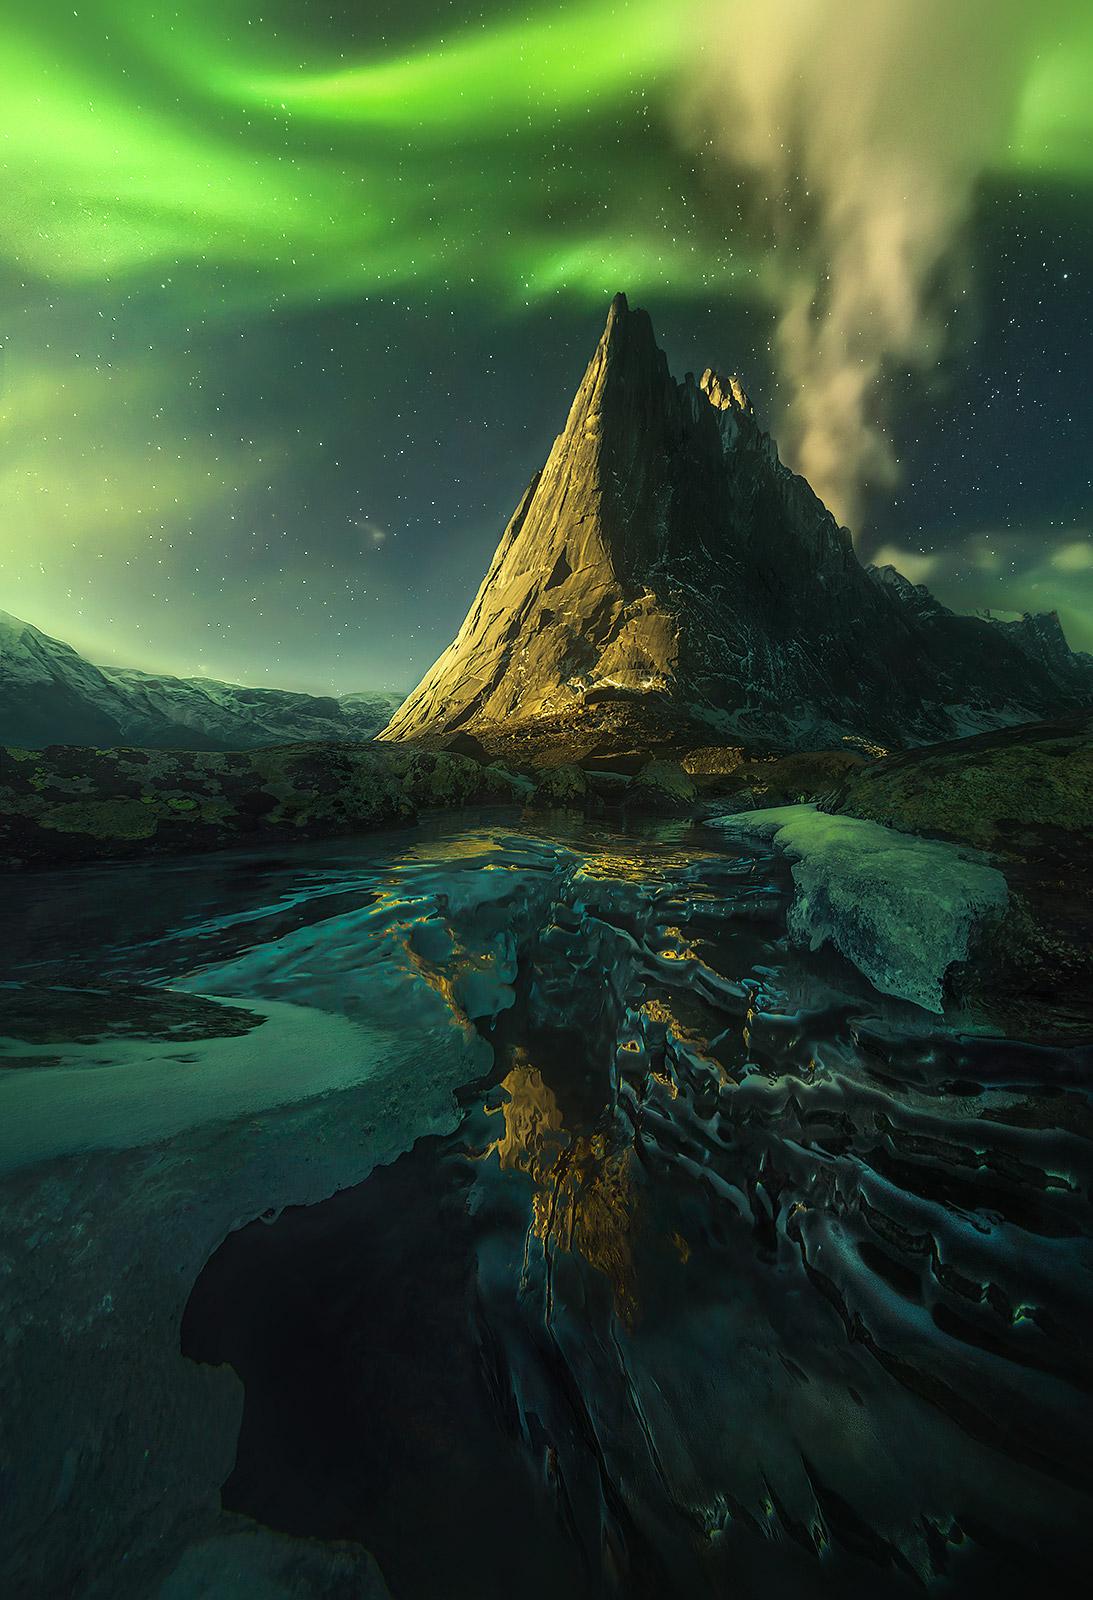 Mackenzie, nwt, nahanni, Yukon, canada, aurora, peaks, photo